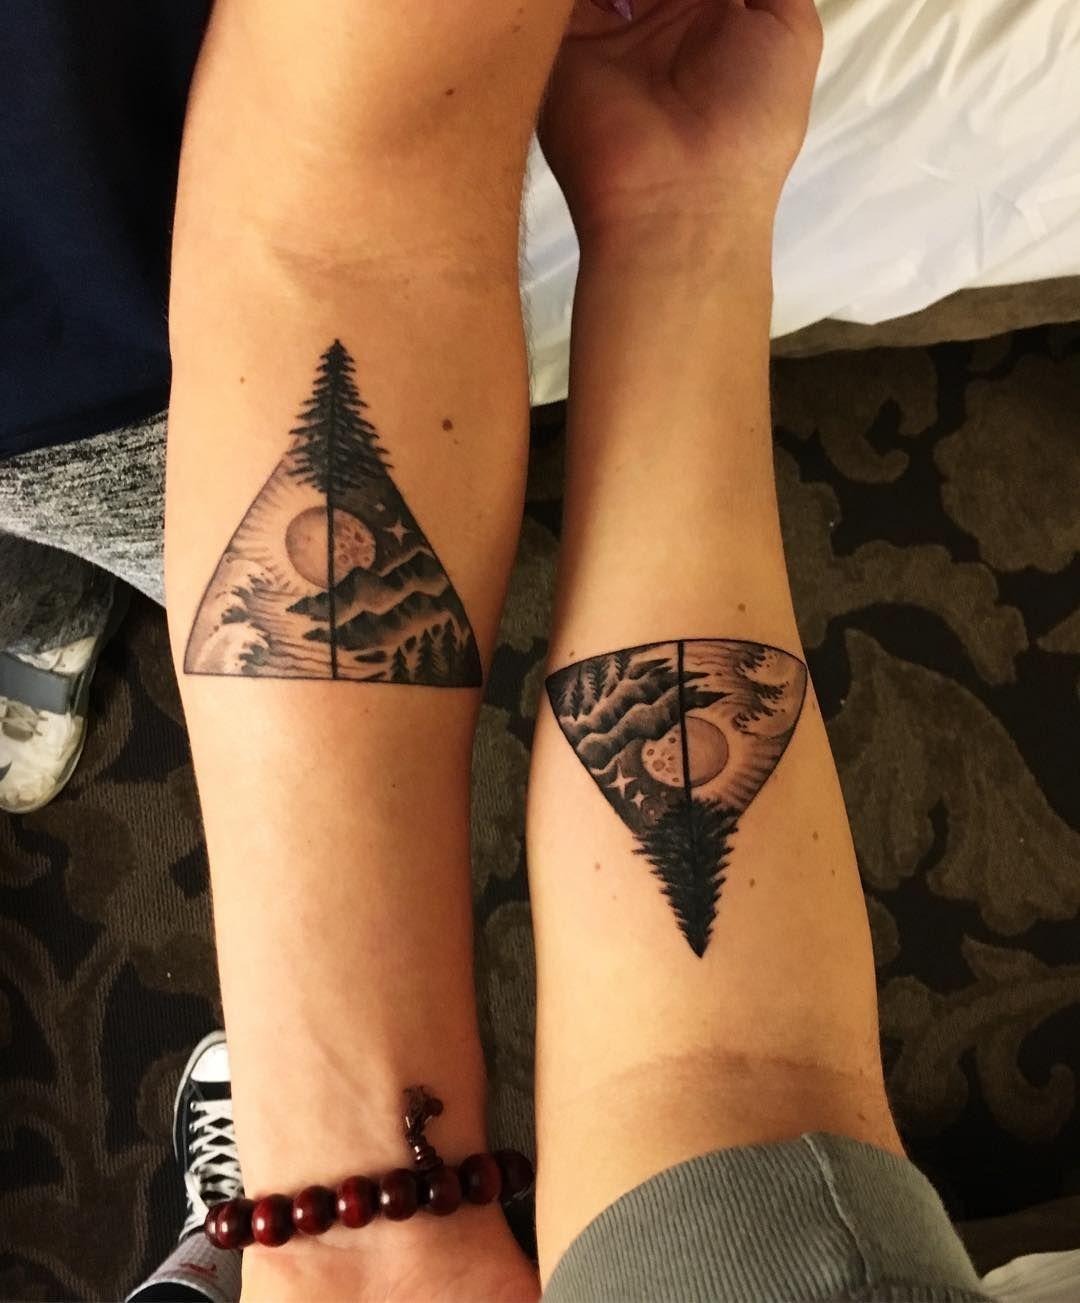 BrotherSister Tattoos POPSUGAR Celebrity Twin tattoos